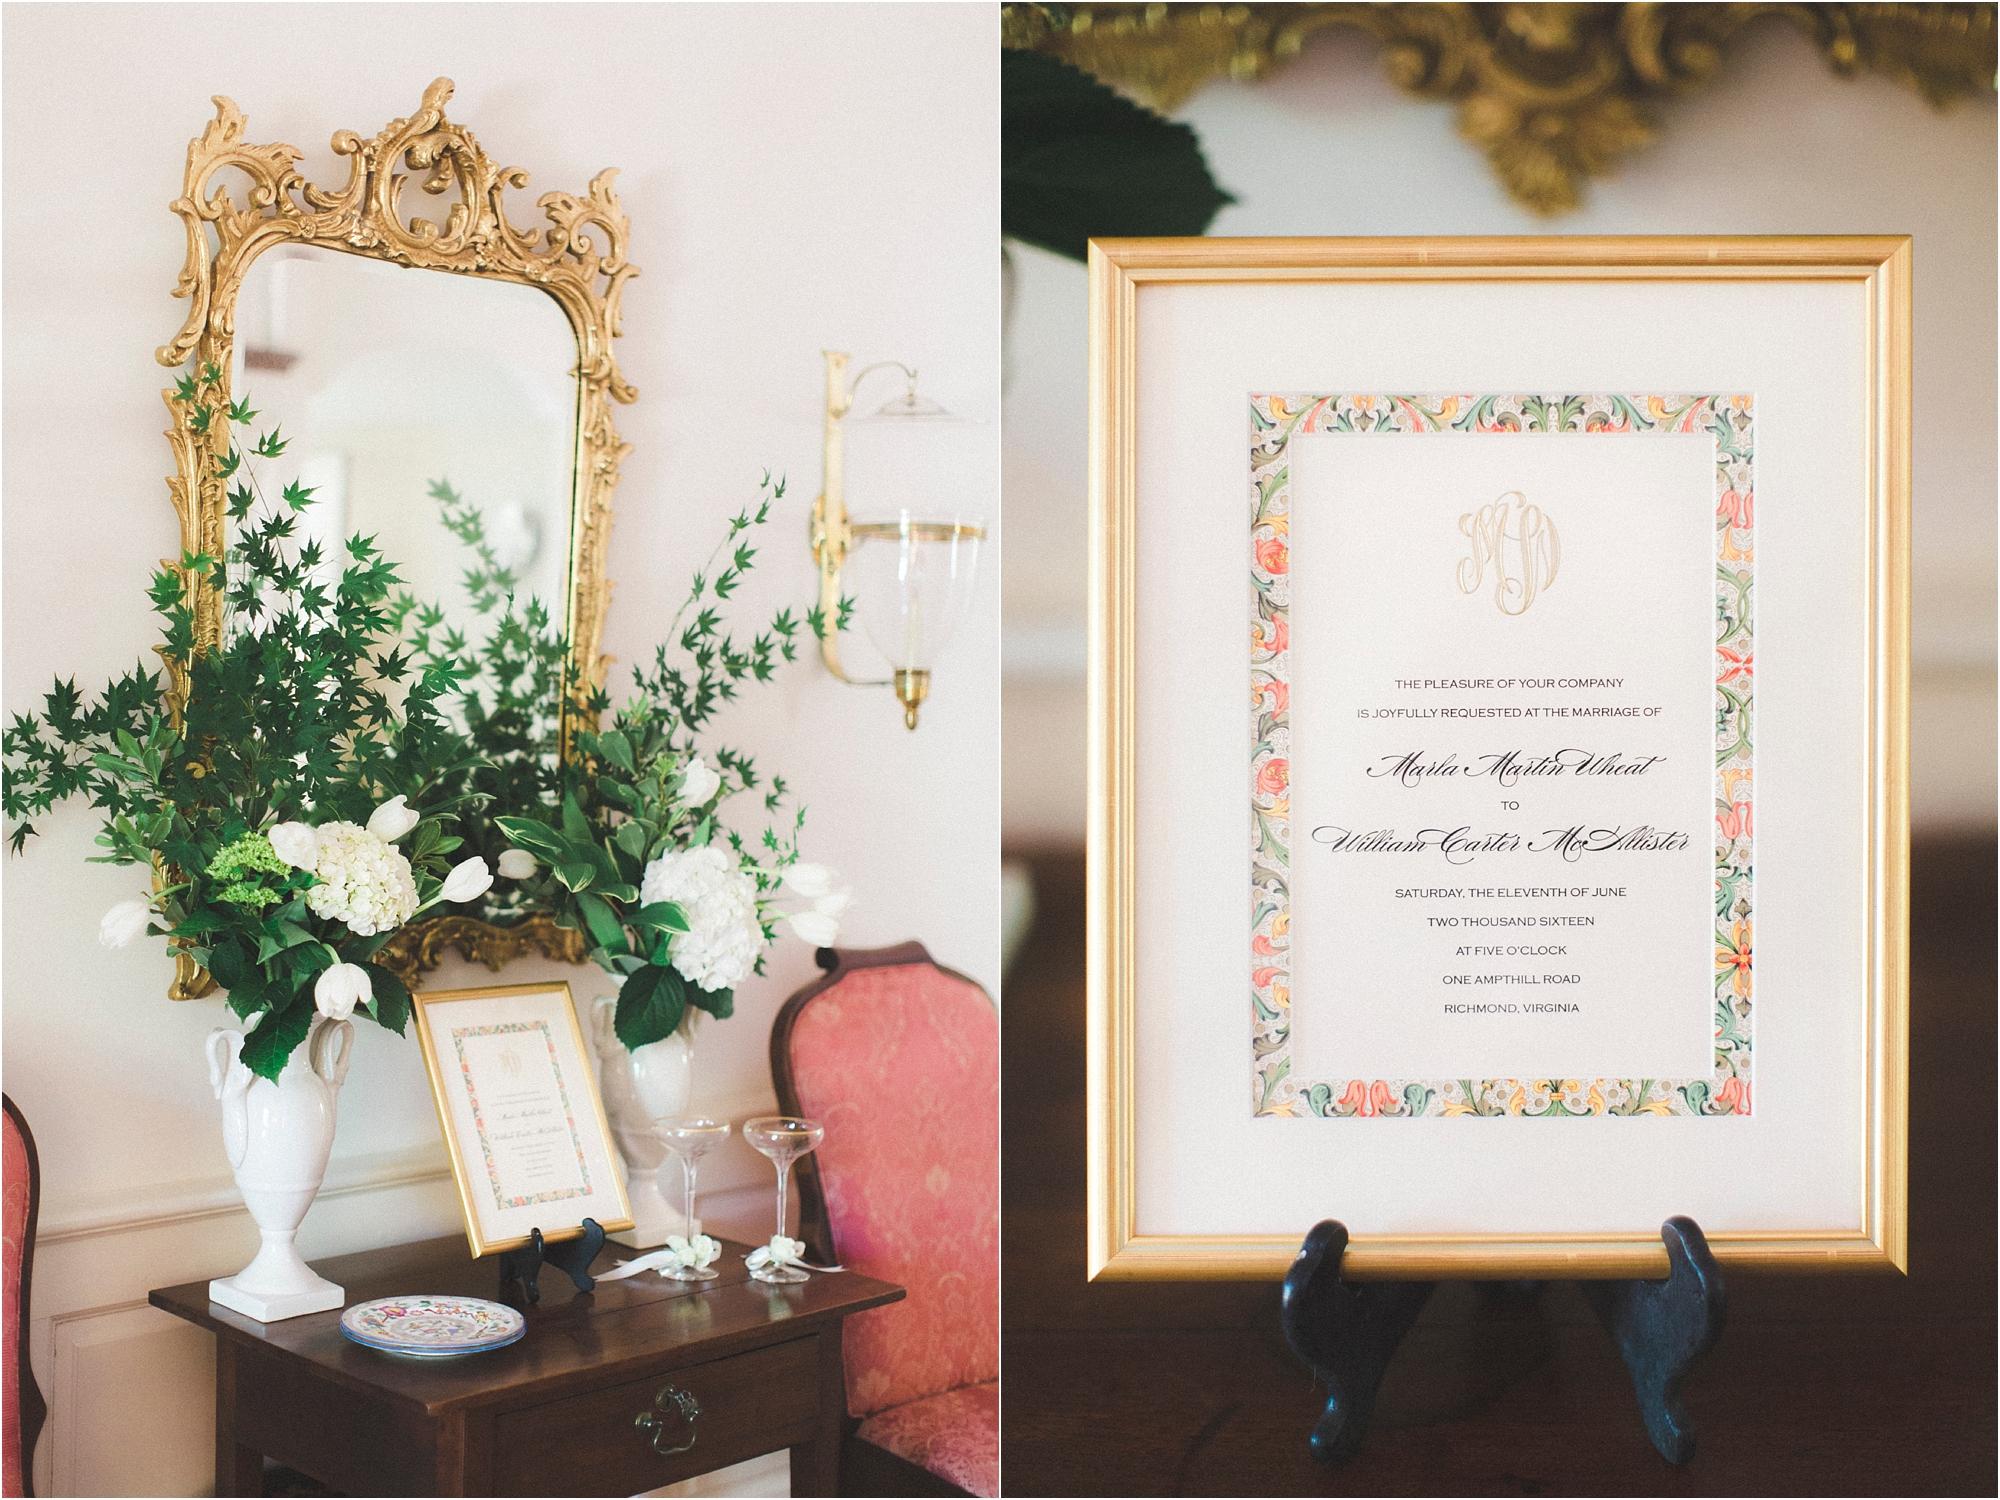 stephanie-yonce-photography-chic-historic-home-wedding-richmond-virginia-photos_0008.jpg